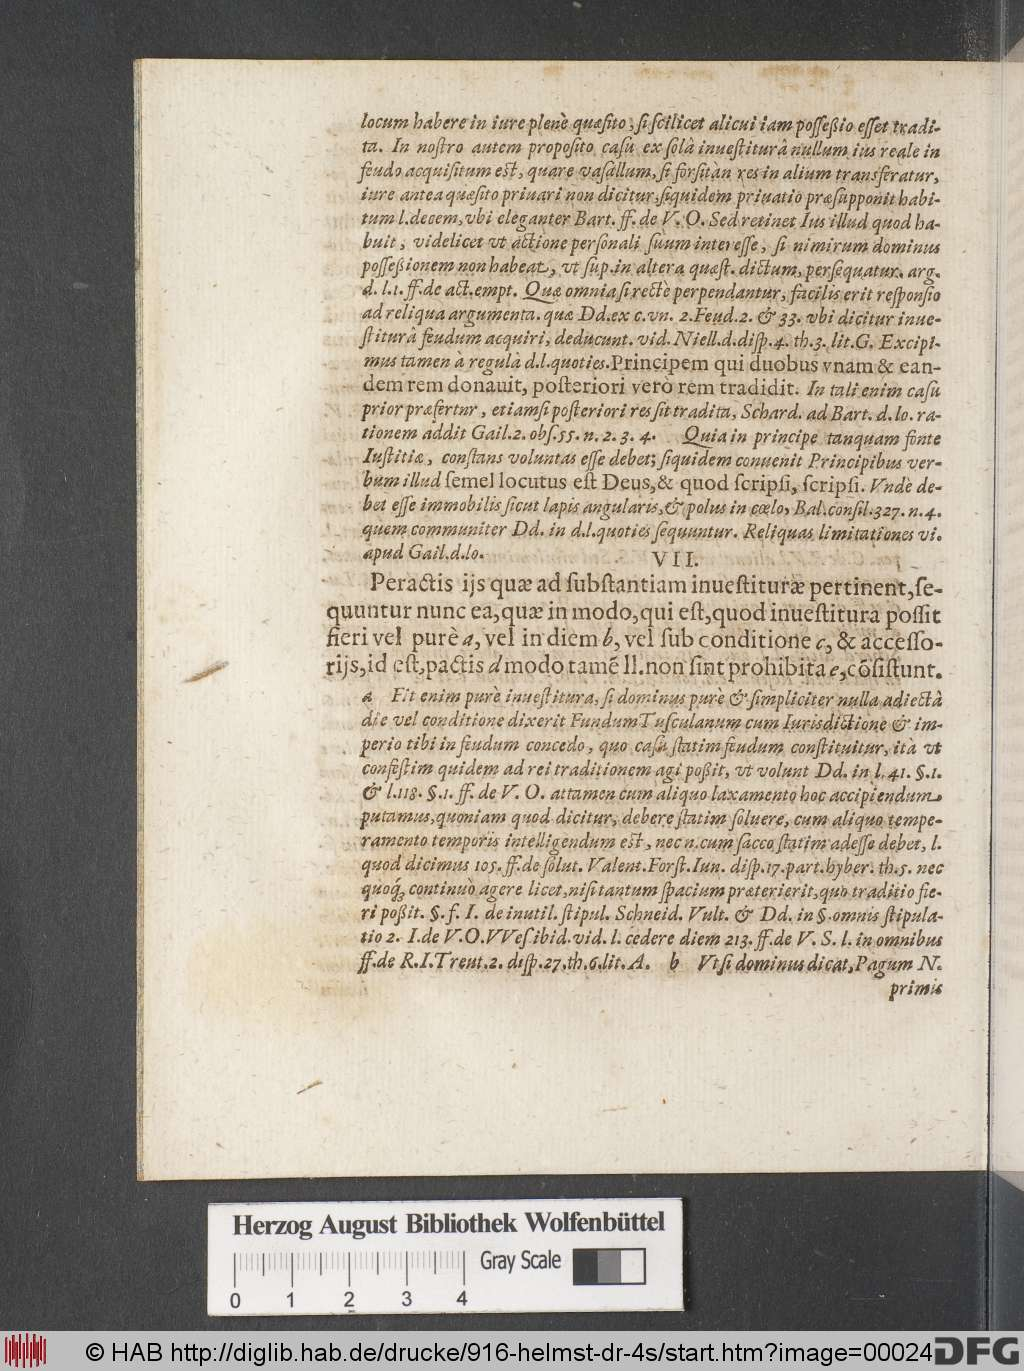 http://diglib.hab.de/drucke/916-helmst-dr-4s/00024.jpg